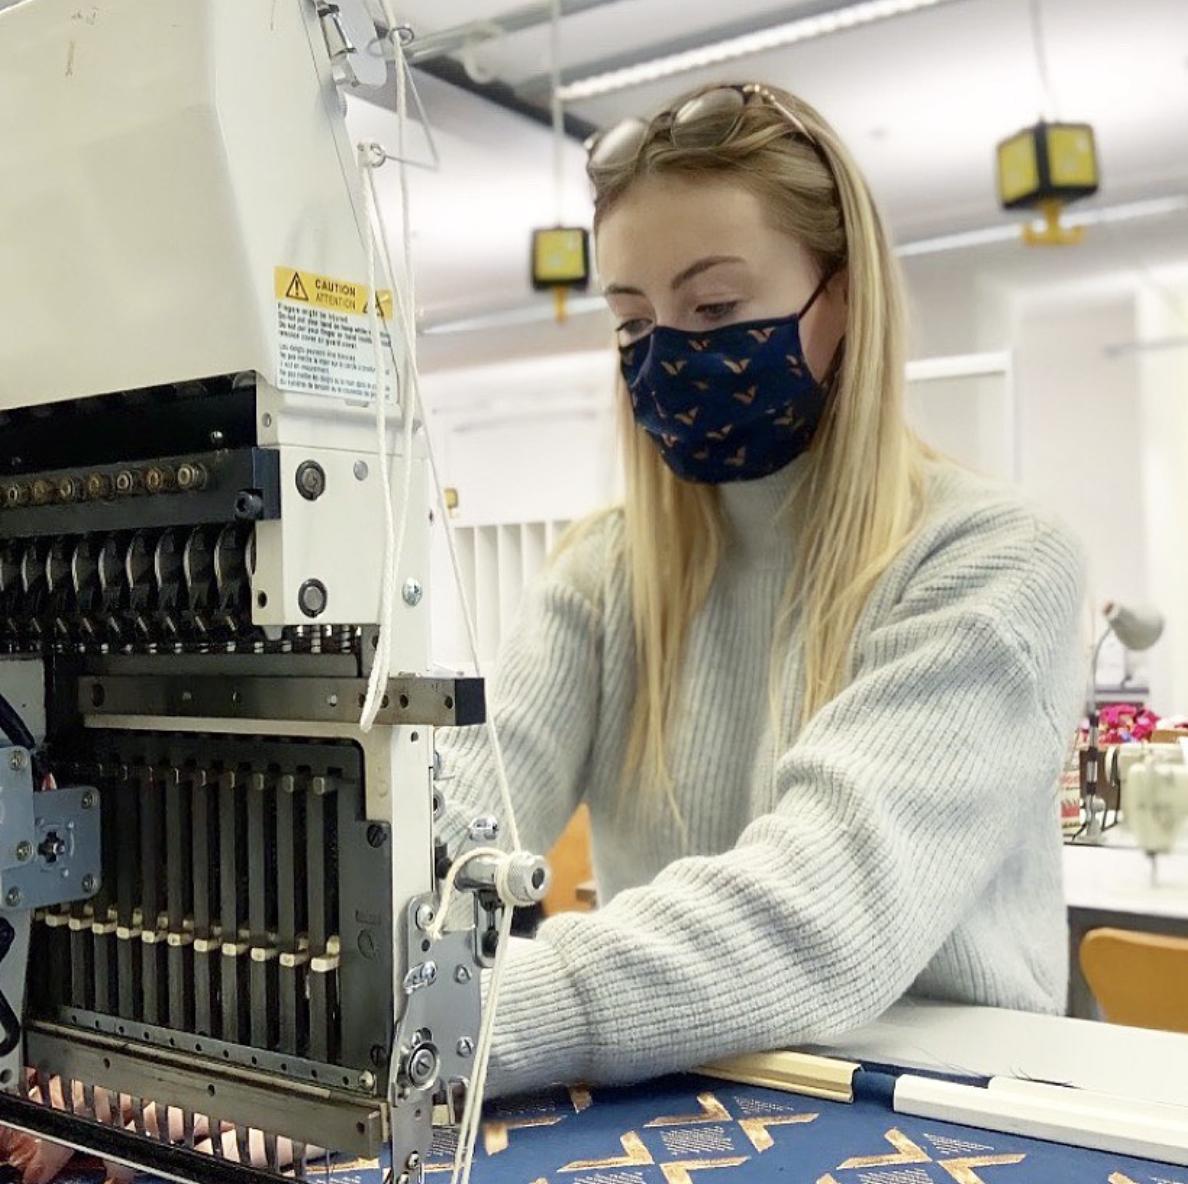 Robyn Elliot working on her sewing machine.